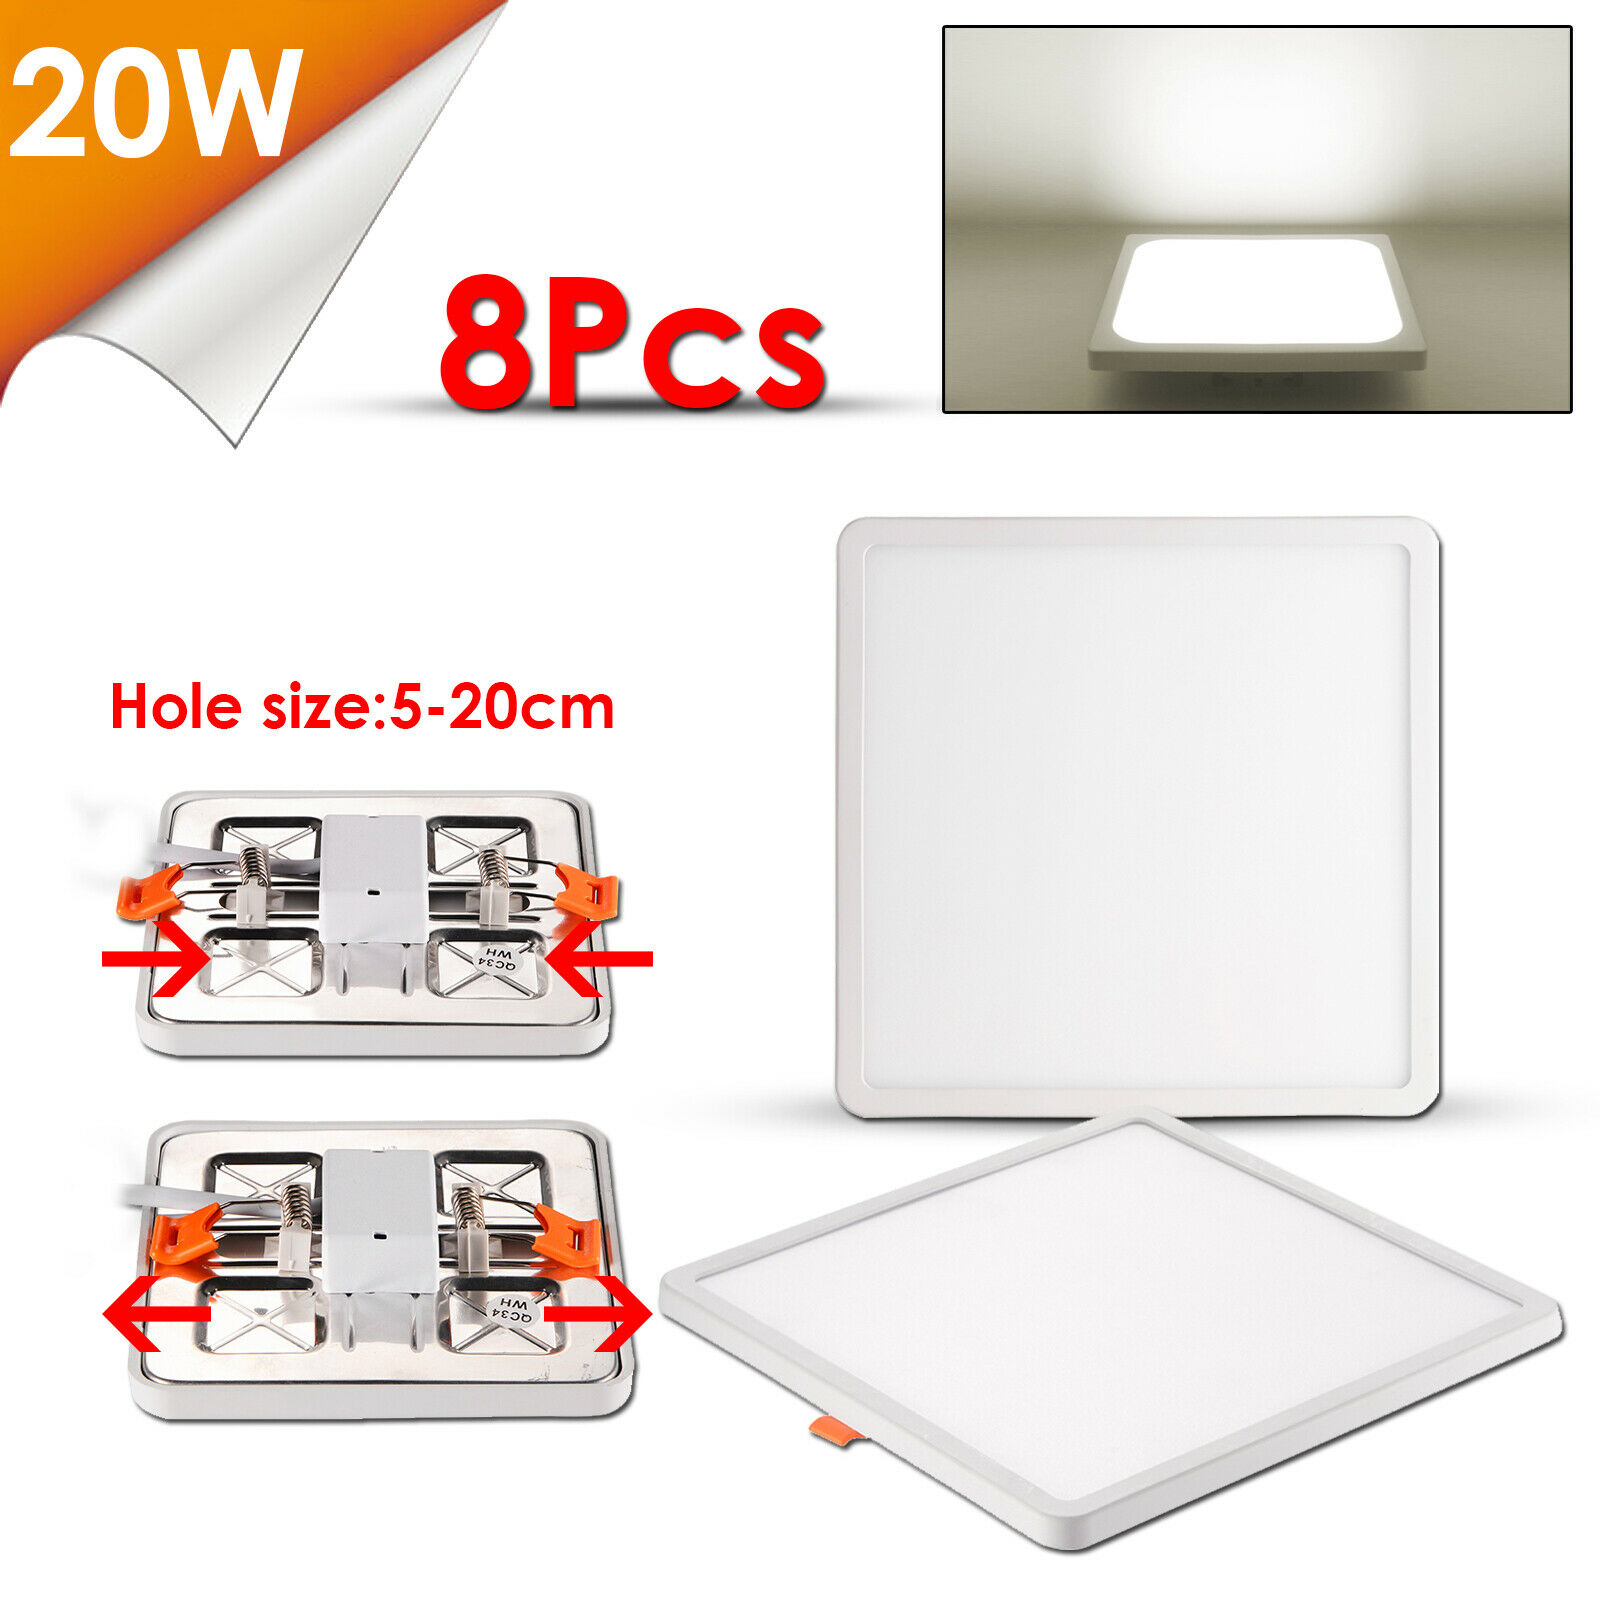 8x 20w LED Panel instalación emisor medidor plafón cuadrado neutral blancoo ac220v